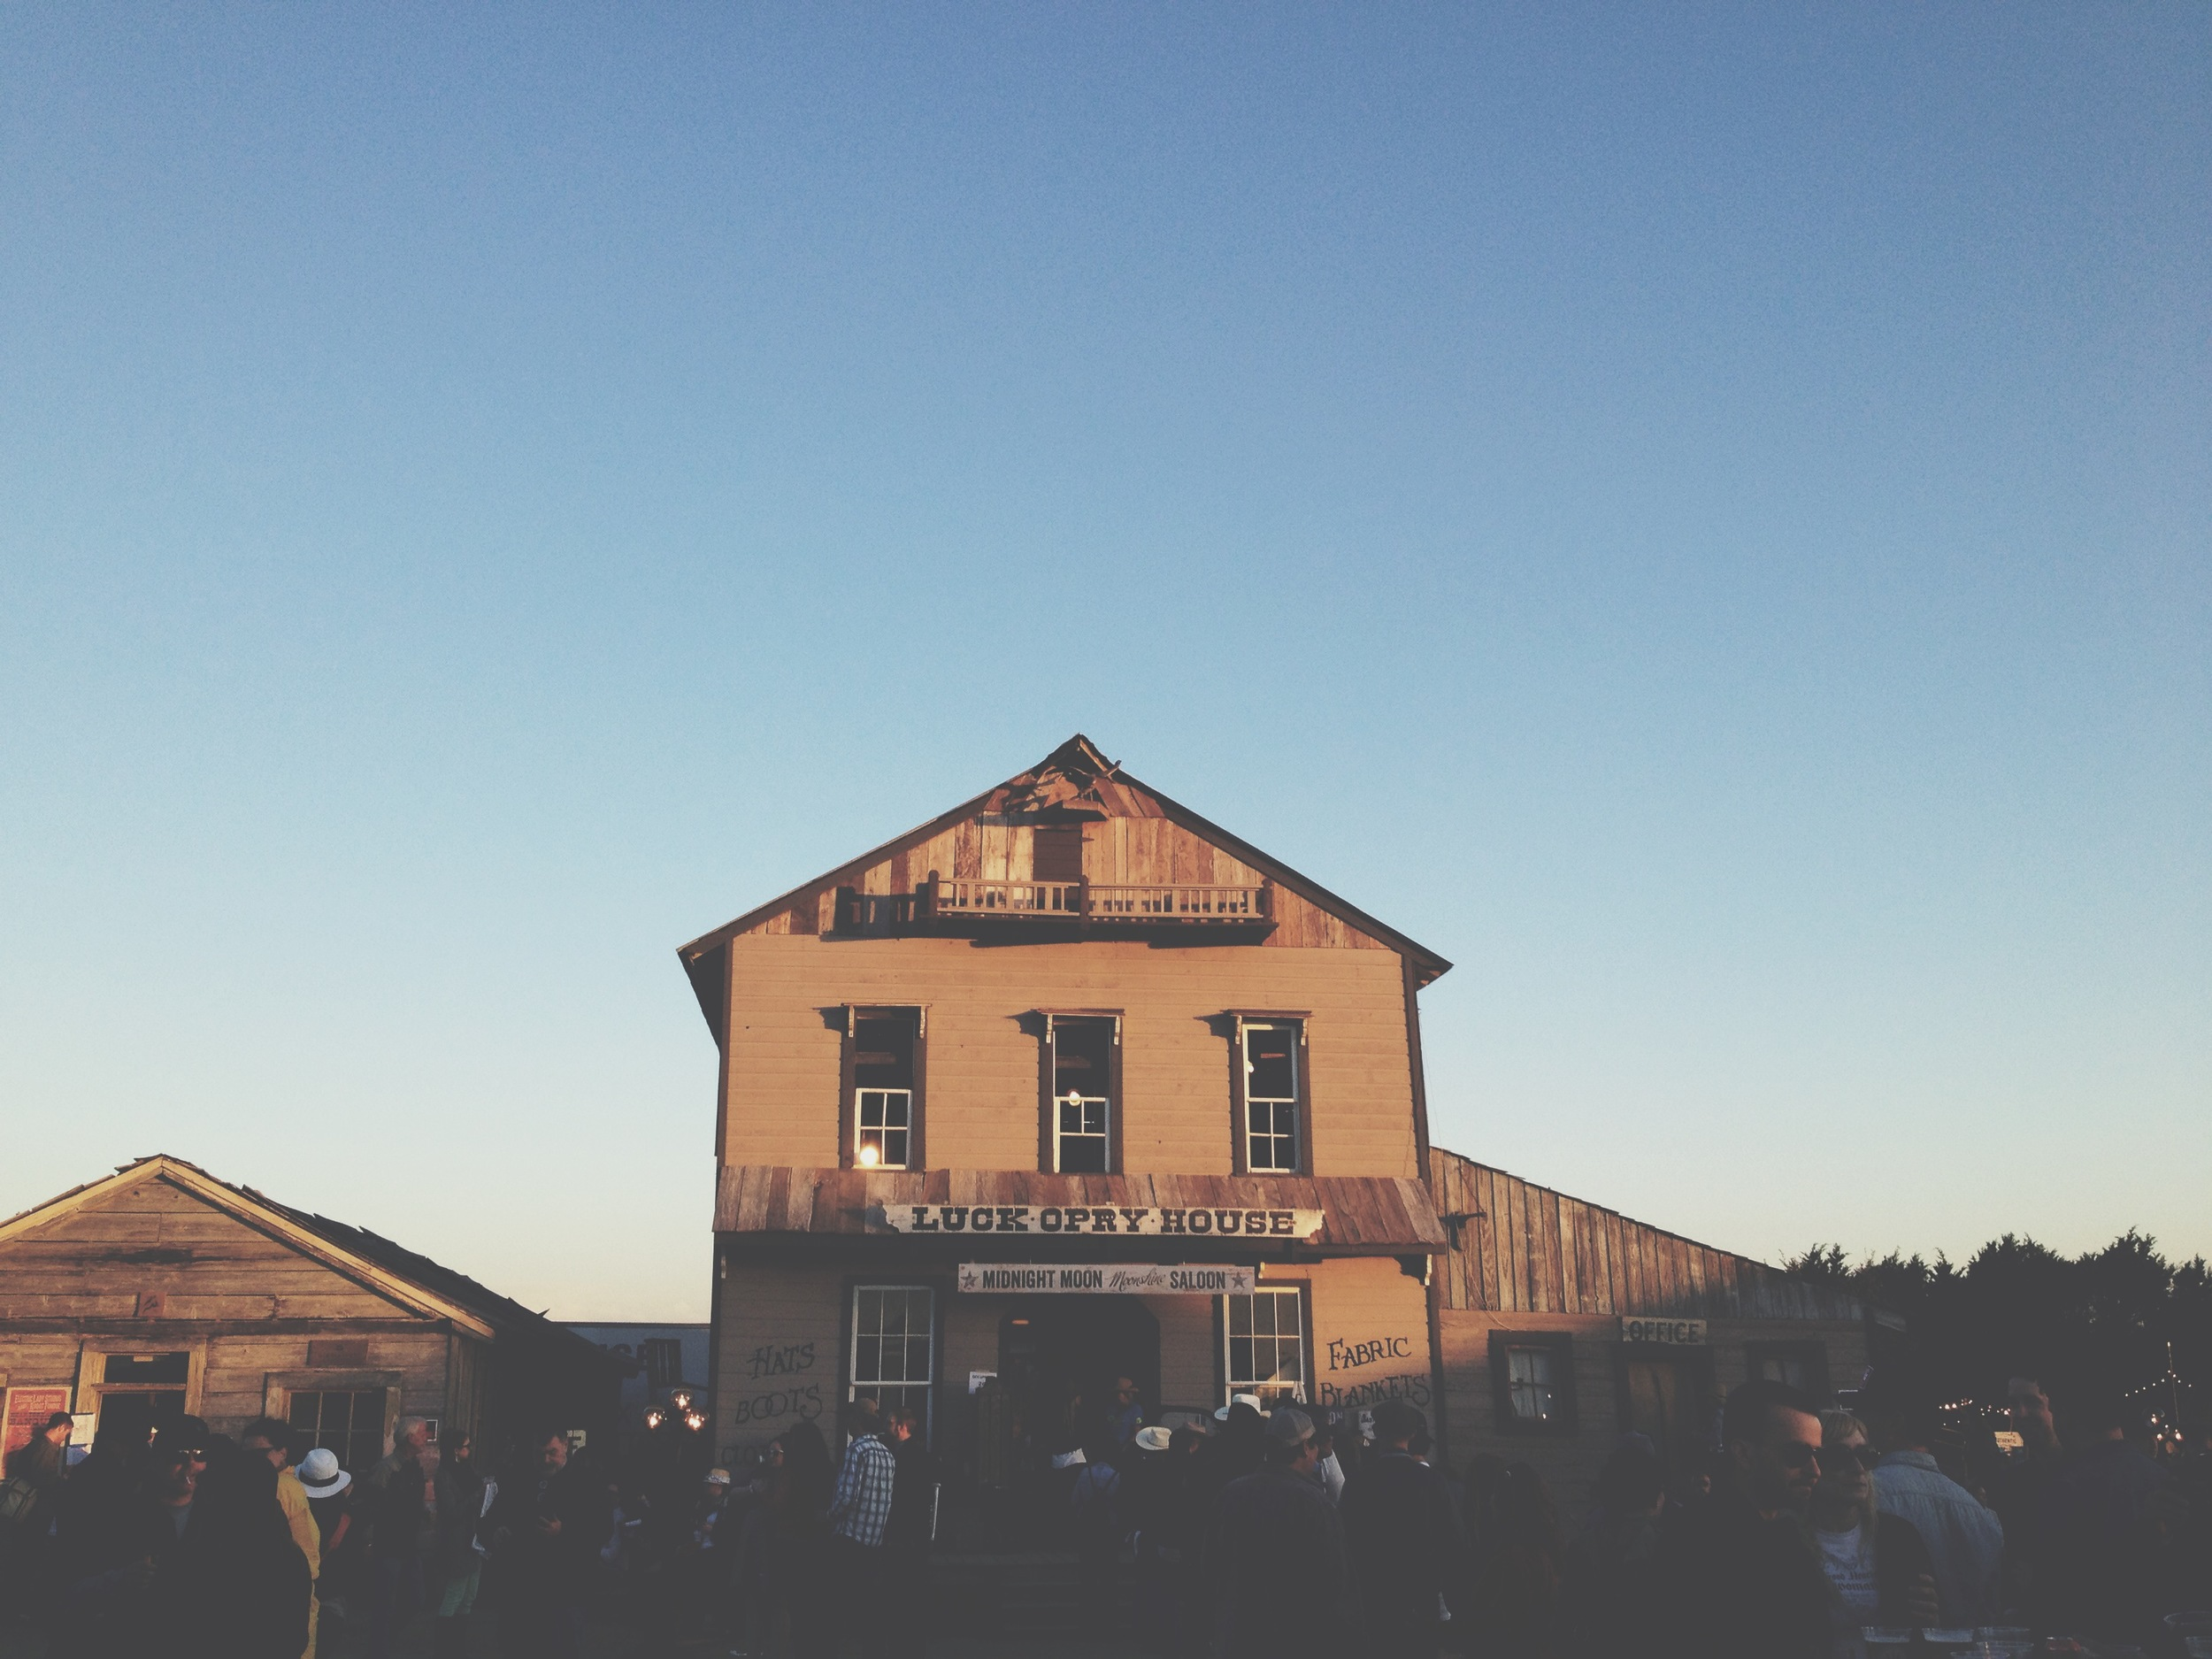 Willie Neslon's Ranch